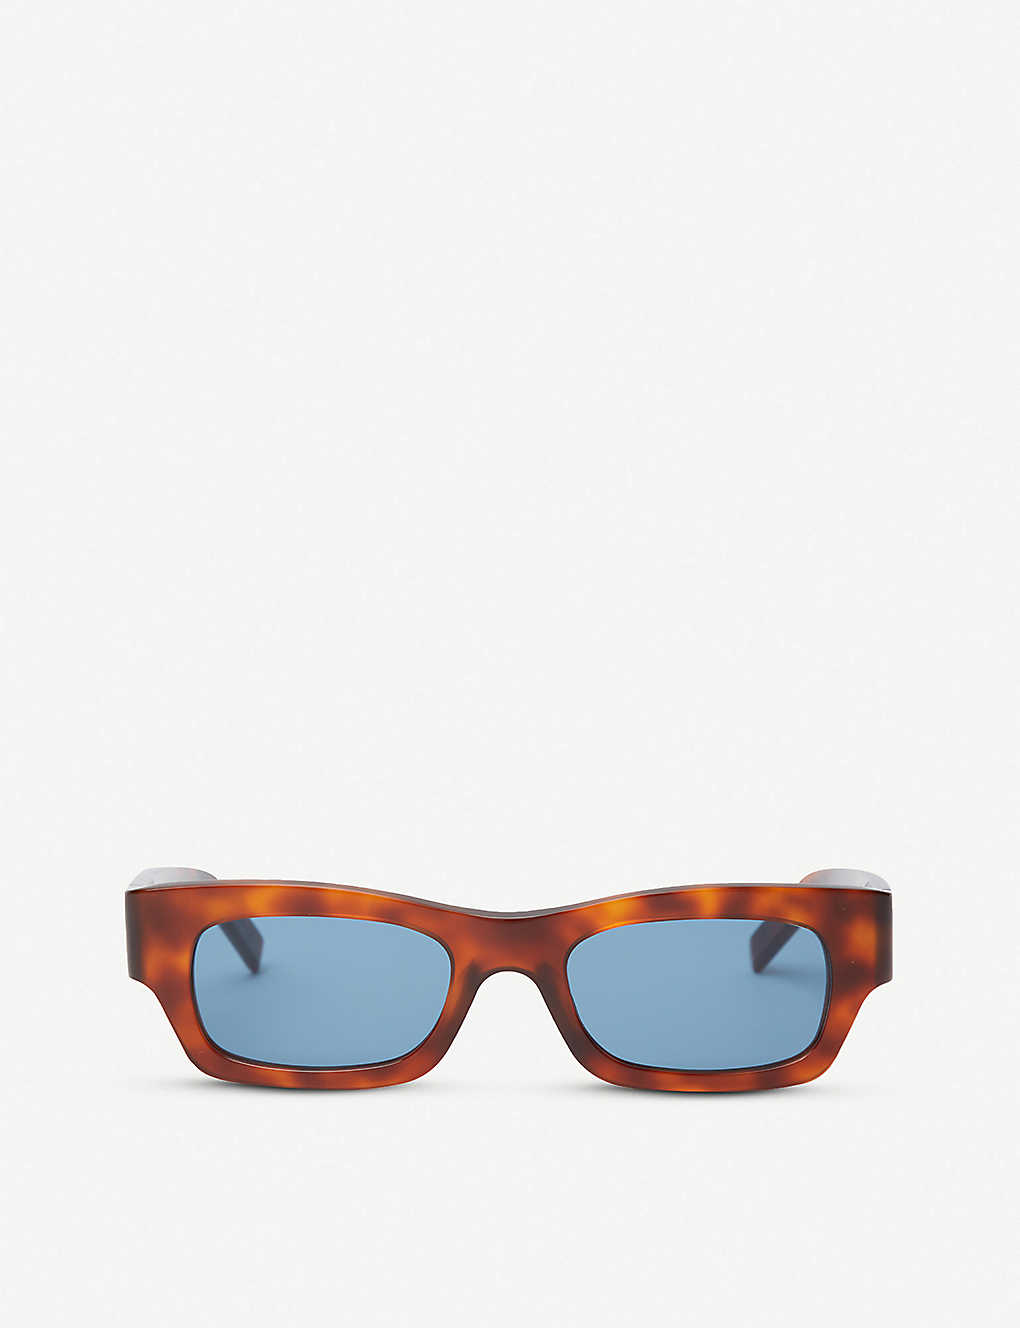 58ac974c50e7c ME627S rectangular-frame tortoiseshell acetate sunglasses - Havana ...